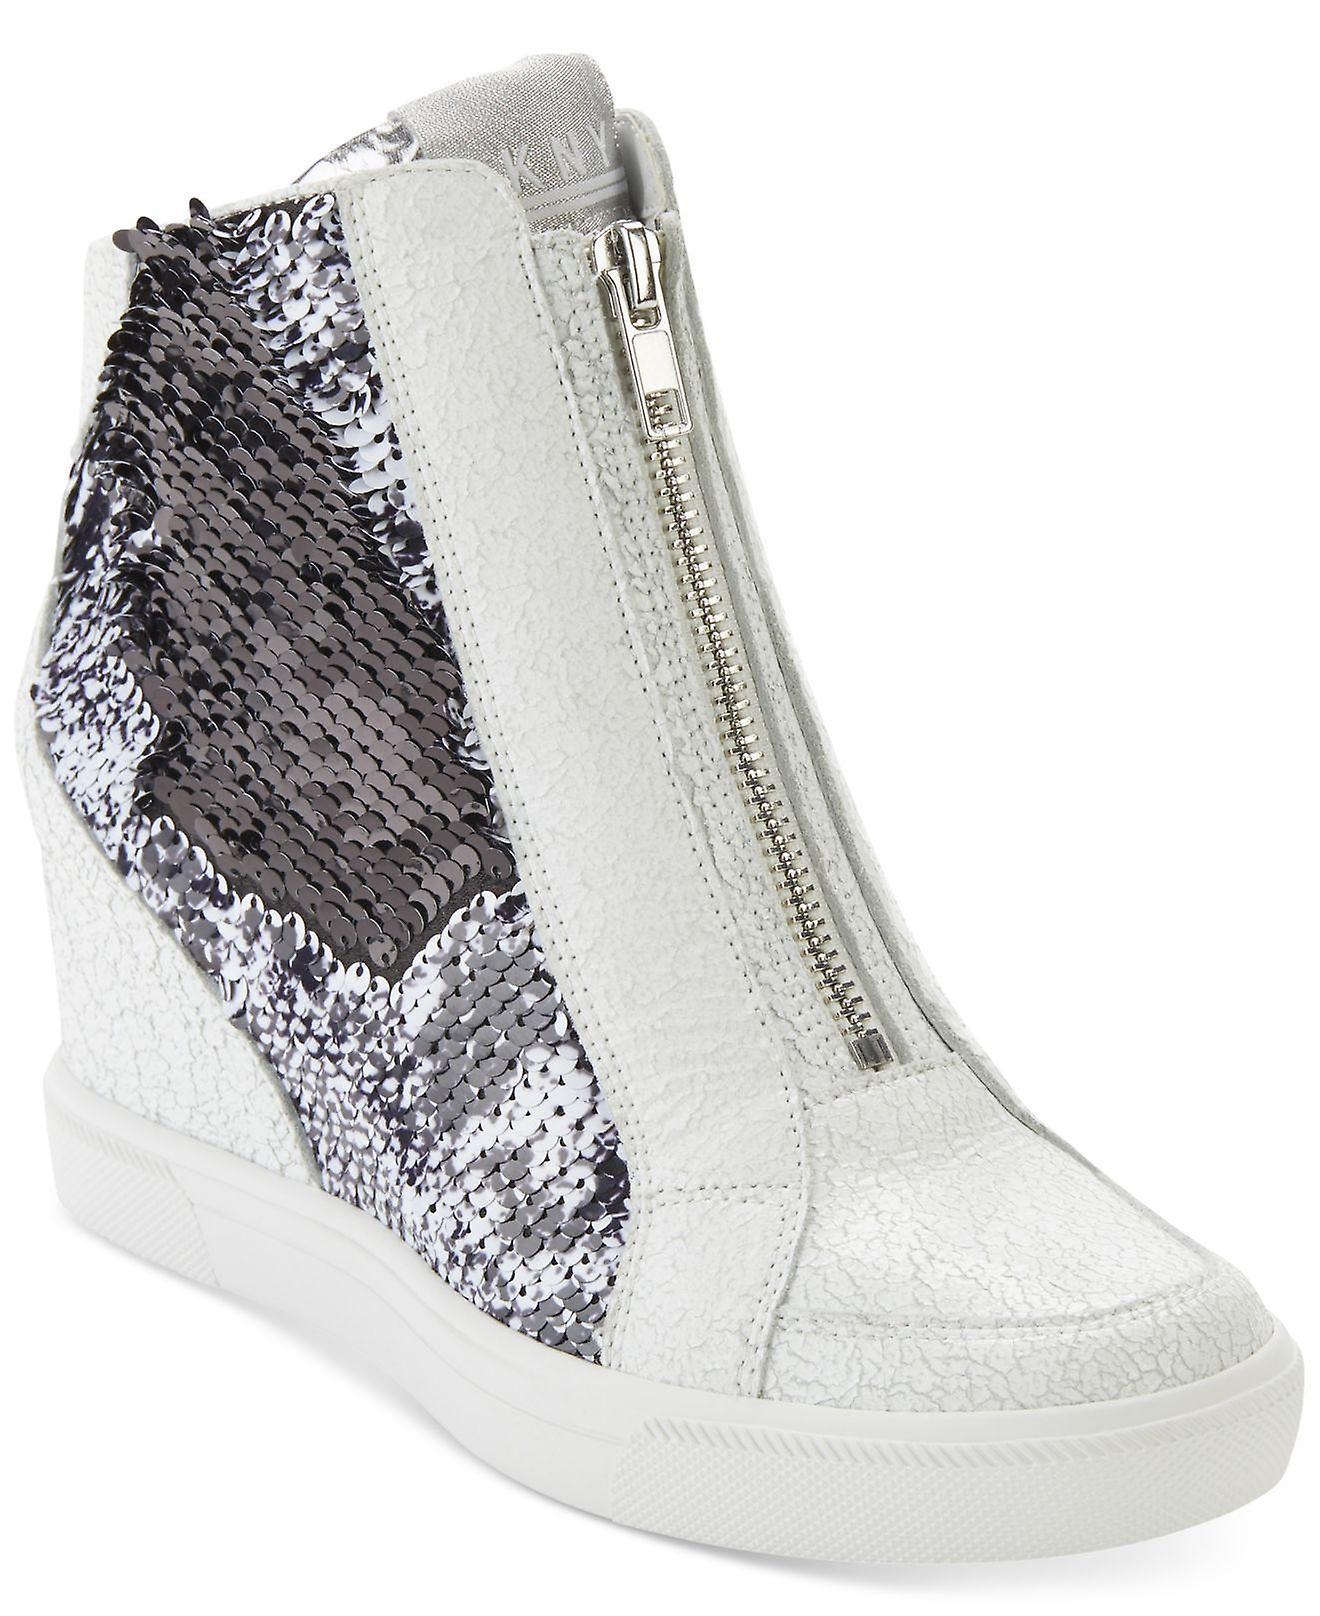 DKNY Femmes Caz Hight Top Zipper Fashion Sneakers